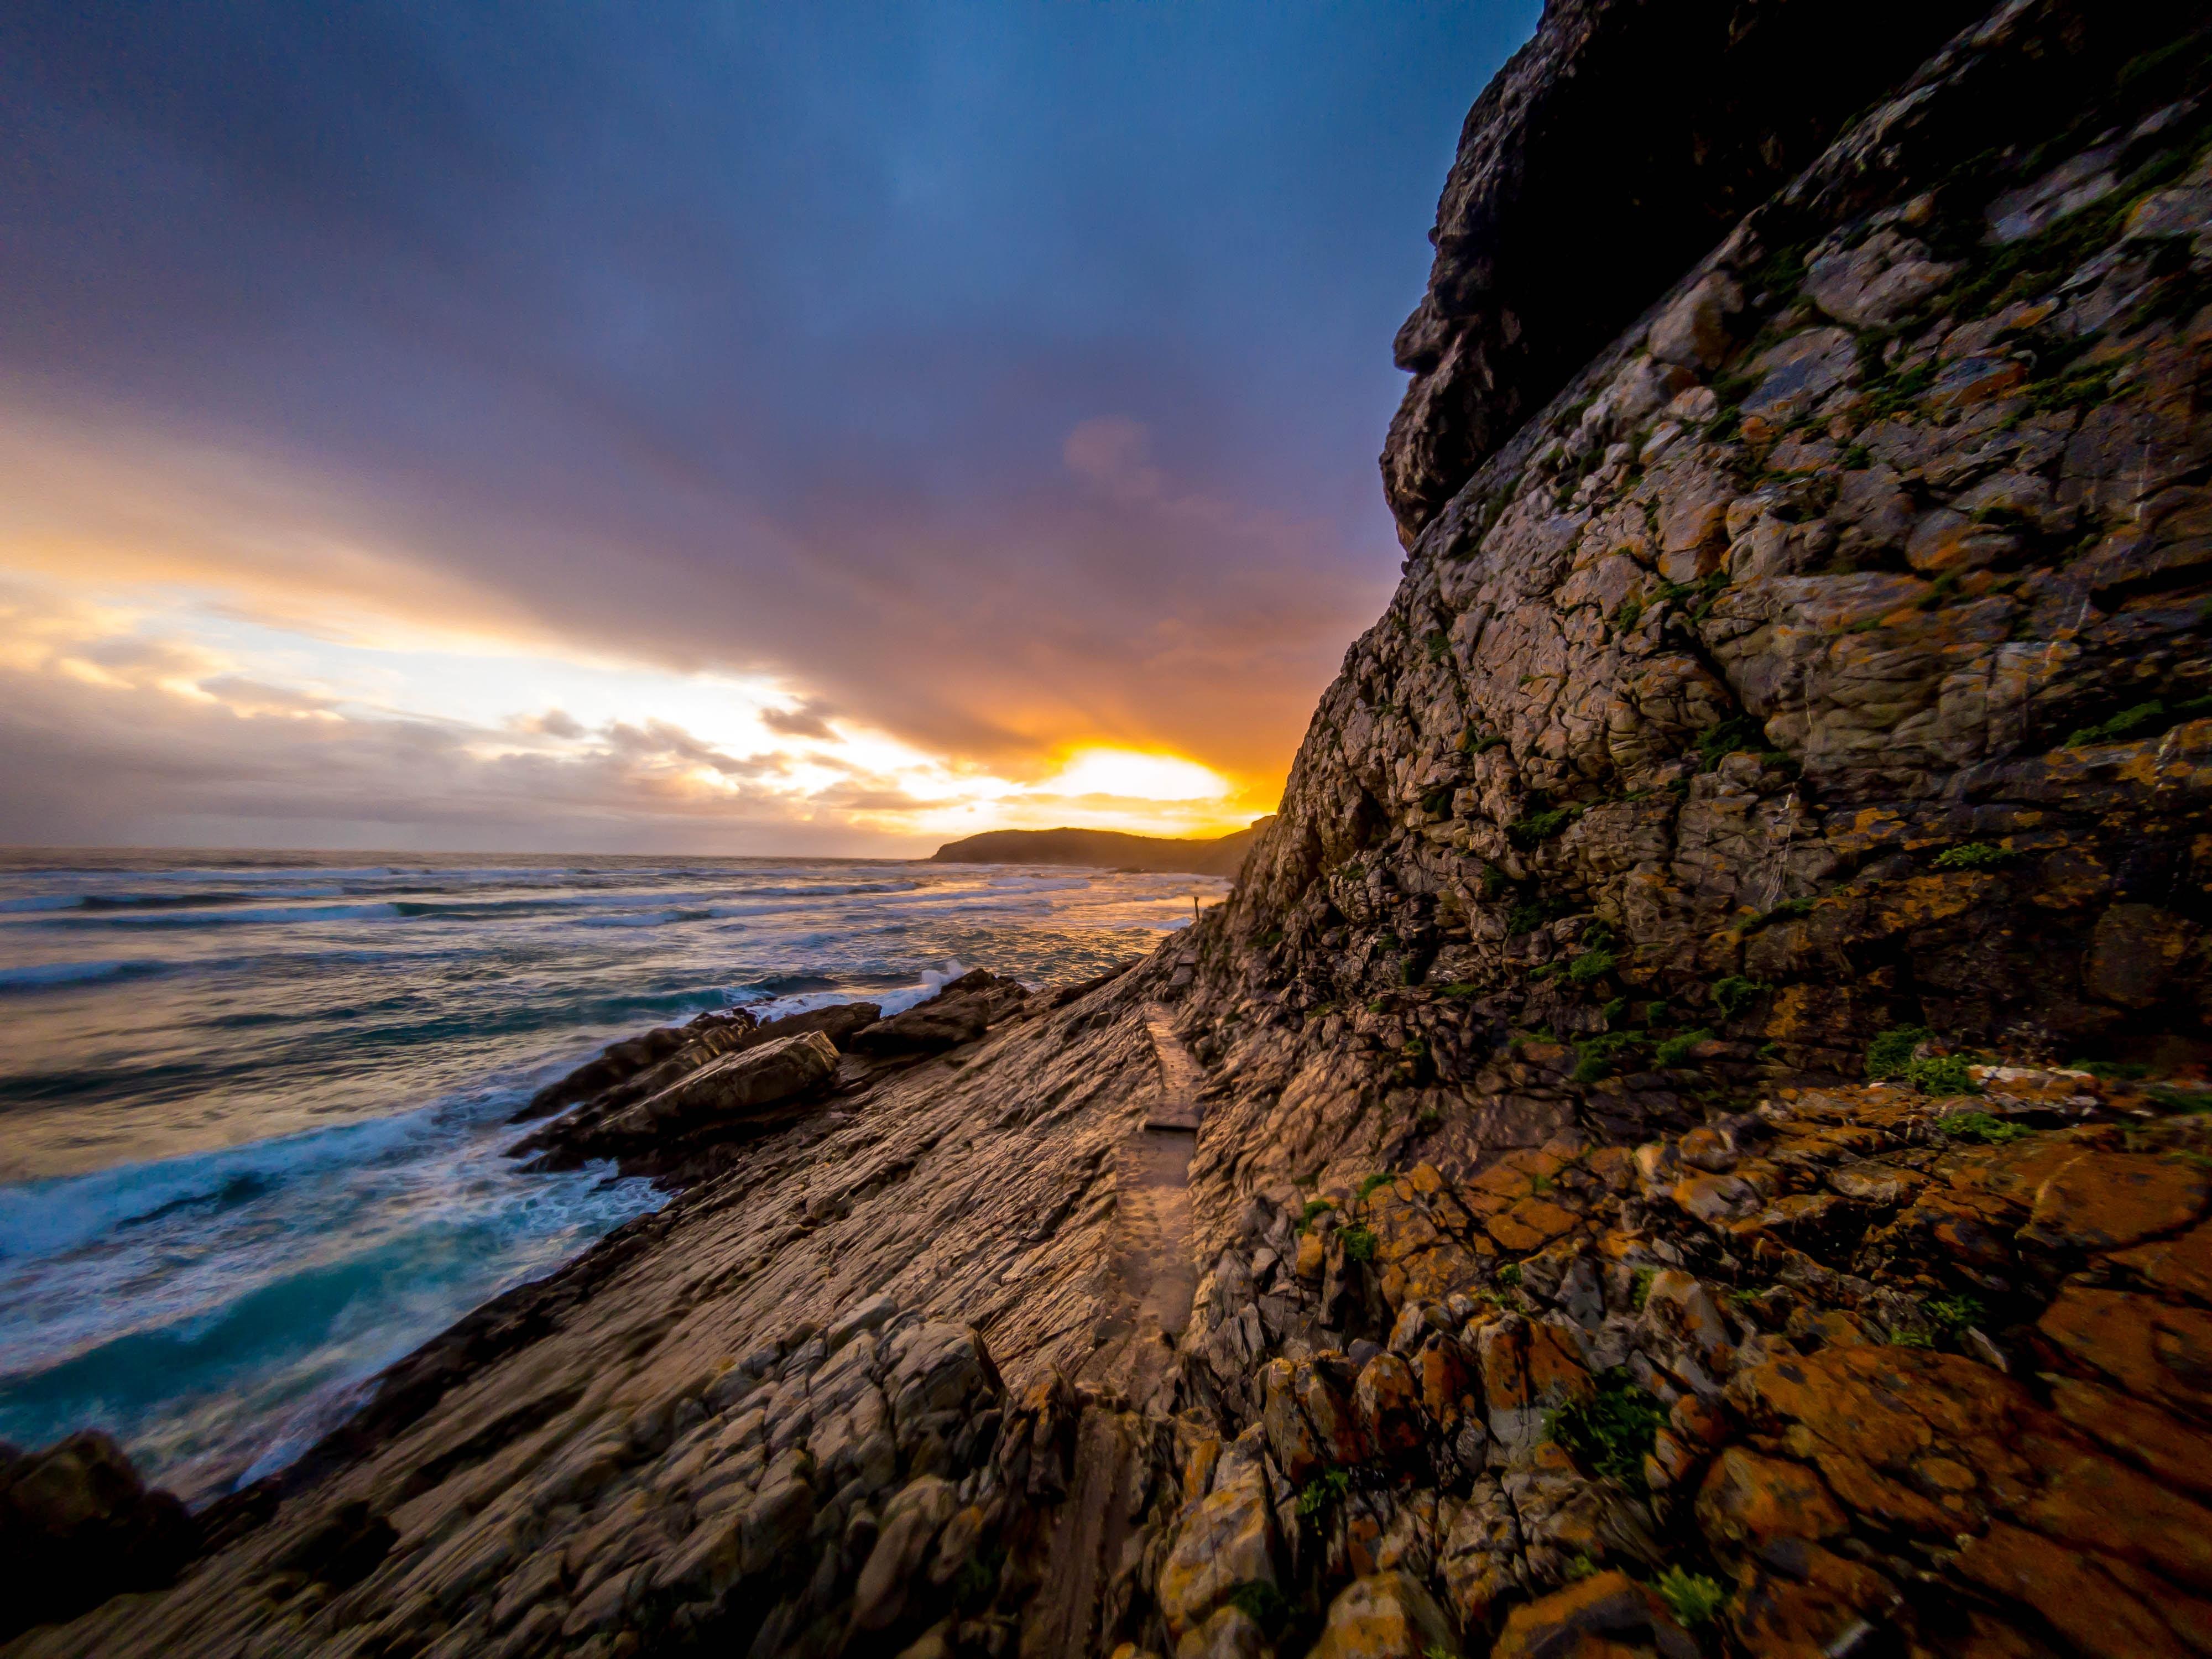 brown rock formation near seashore